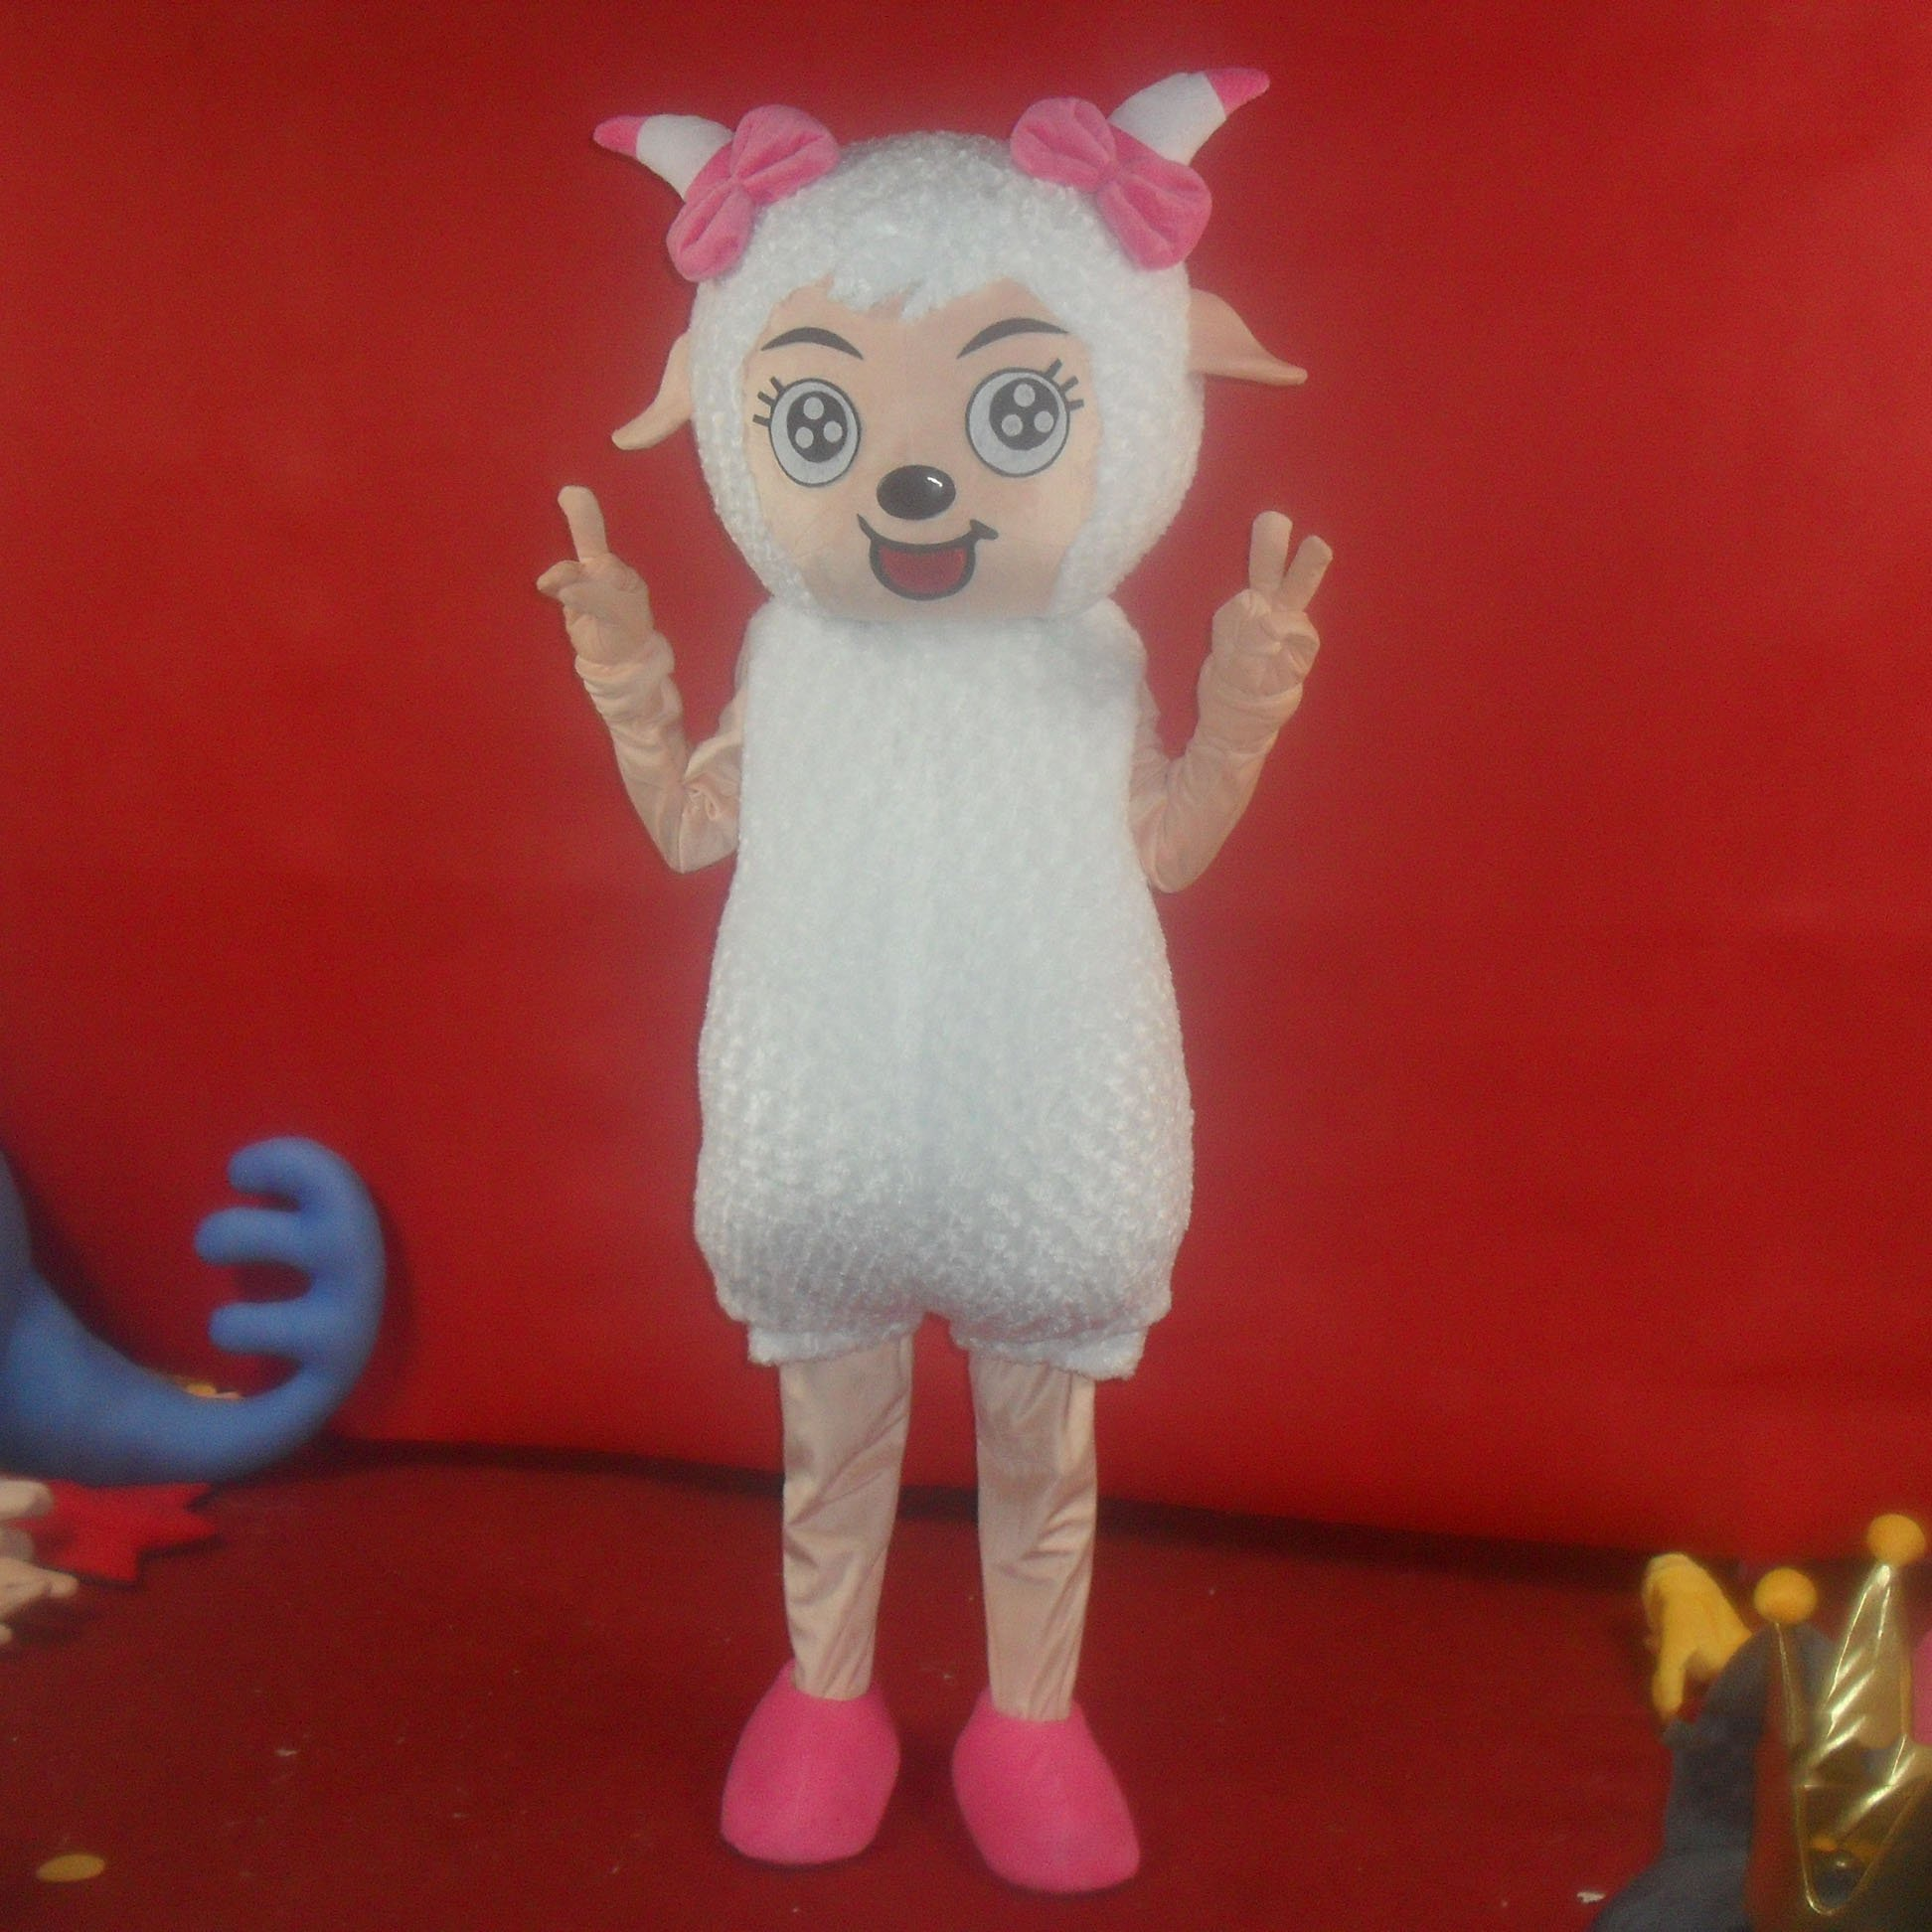 Dolls Walking Cartoon Animation Clothing Radiant Wolf Cartoon Dolls Frankie Costumes Mascot Costume